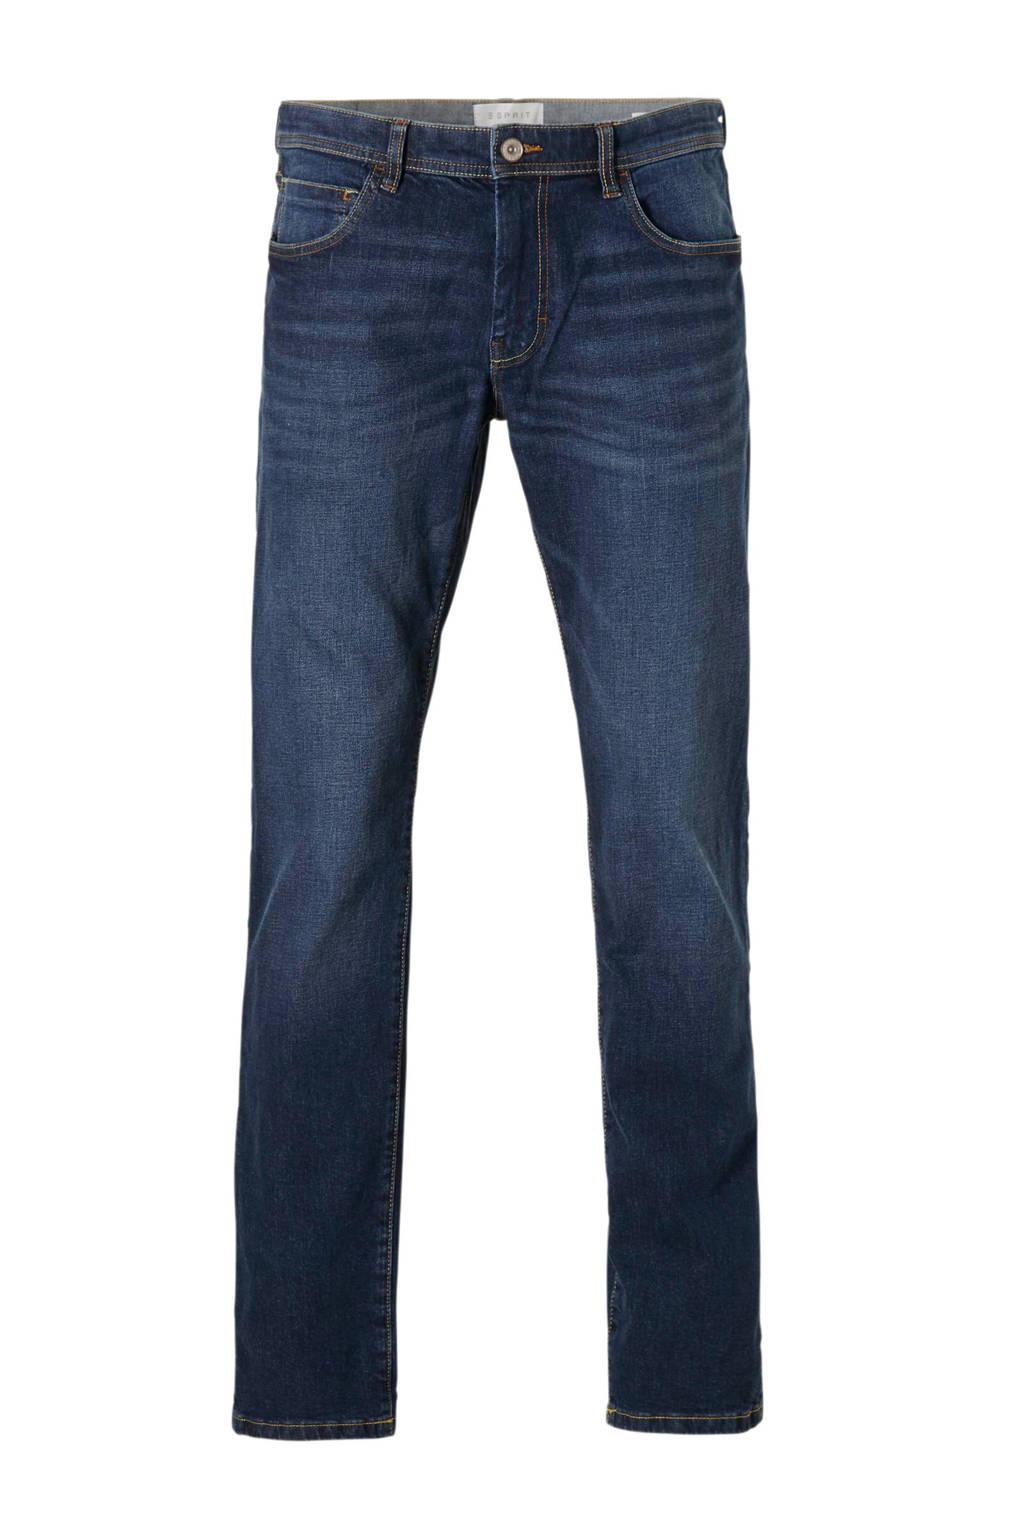 ESPRIT Men Casual  straight straight fit jeans, Dark denim